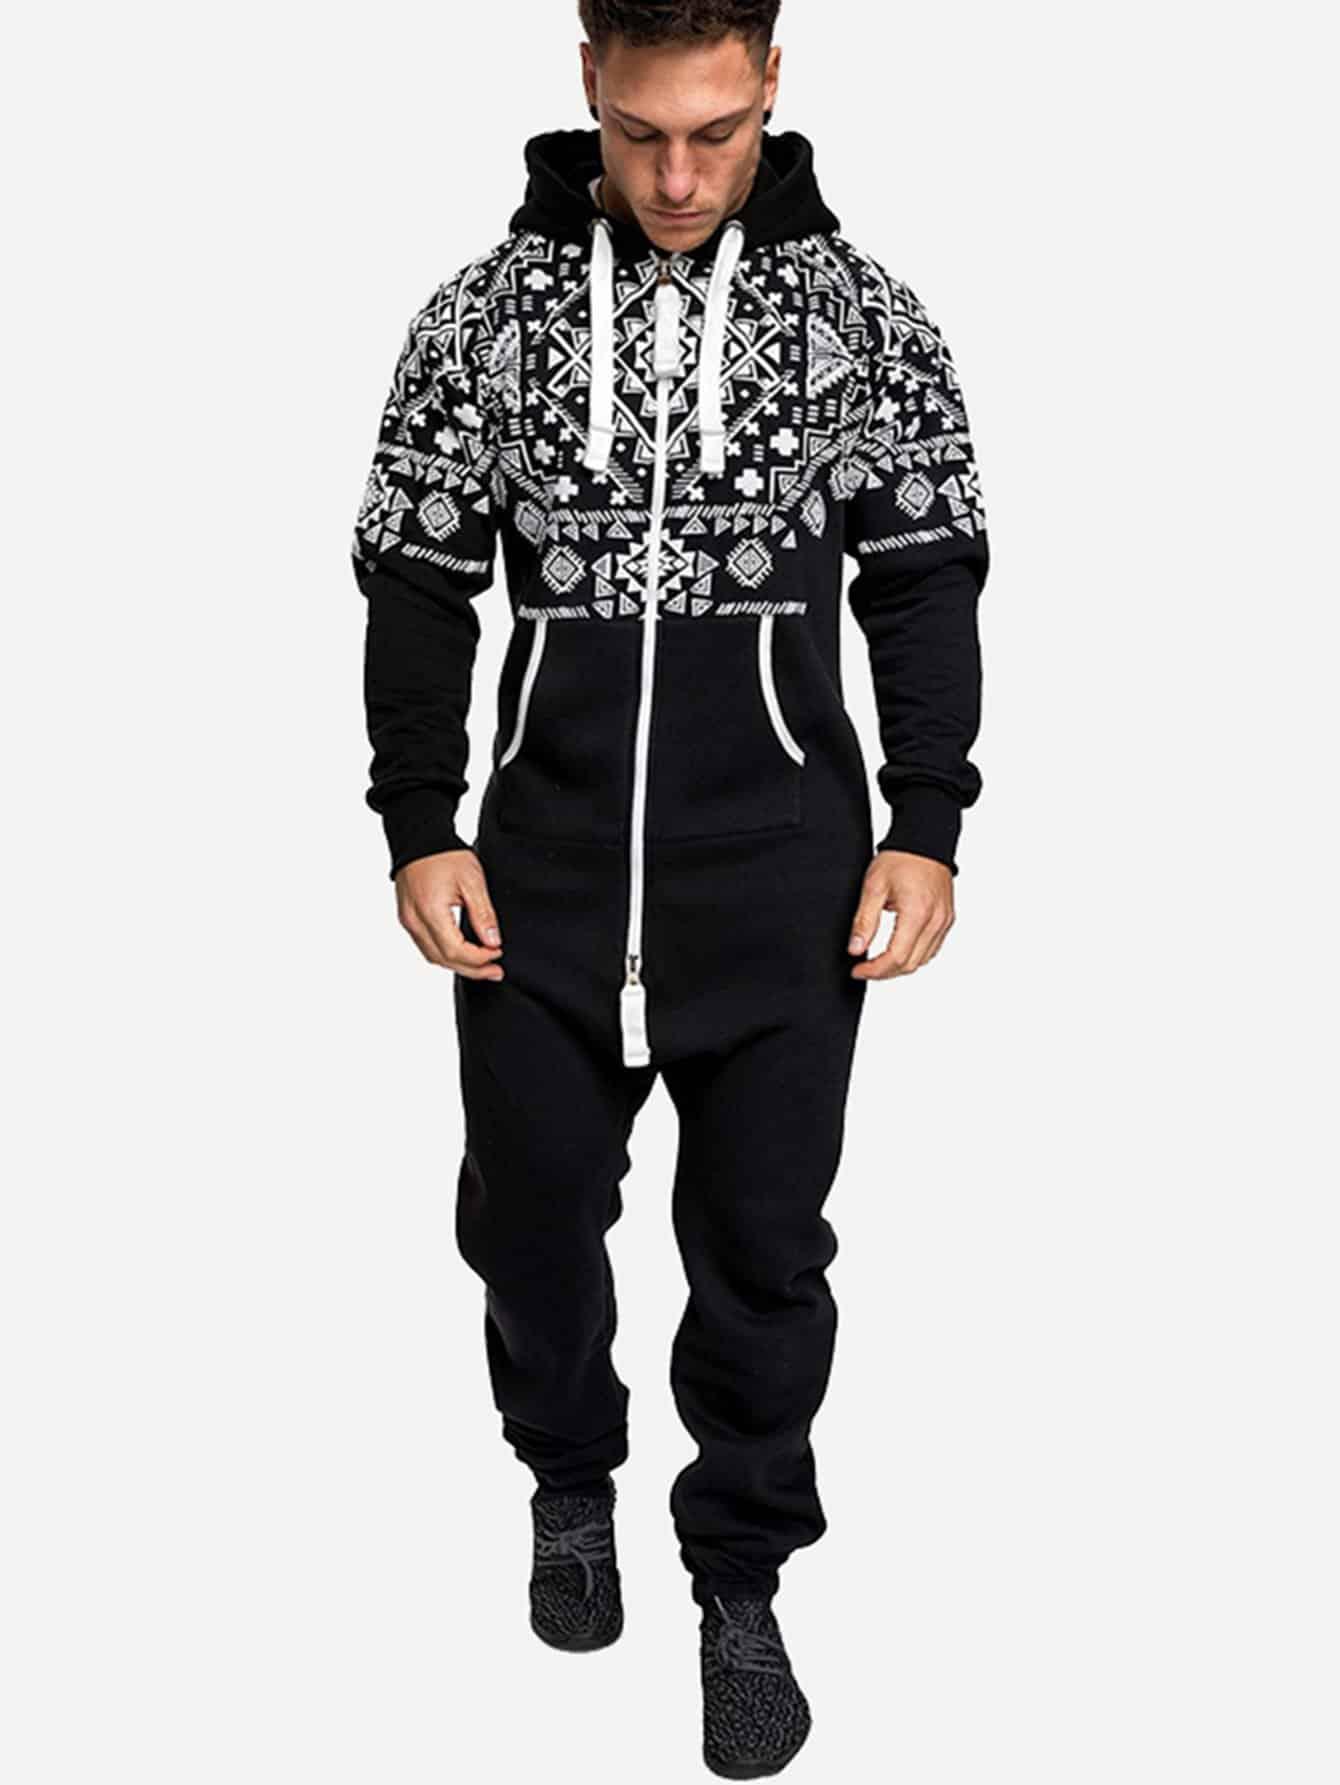 Men Geometric Pattern Drawstring Hooded Jumpsuit Men Geometric Pattern Drawstring Hooded Jumpsuit